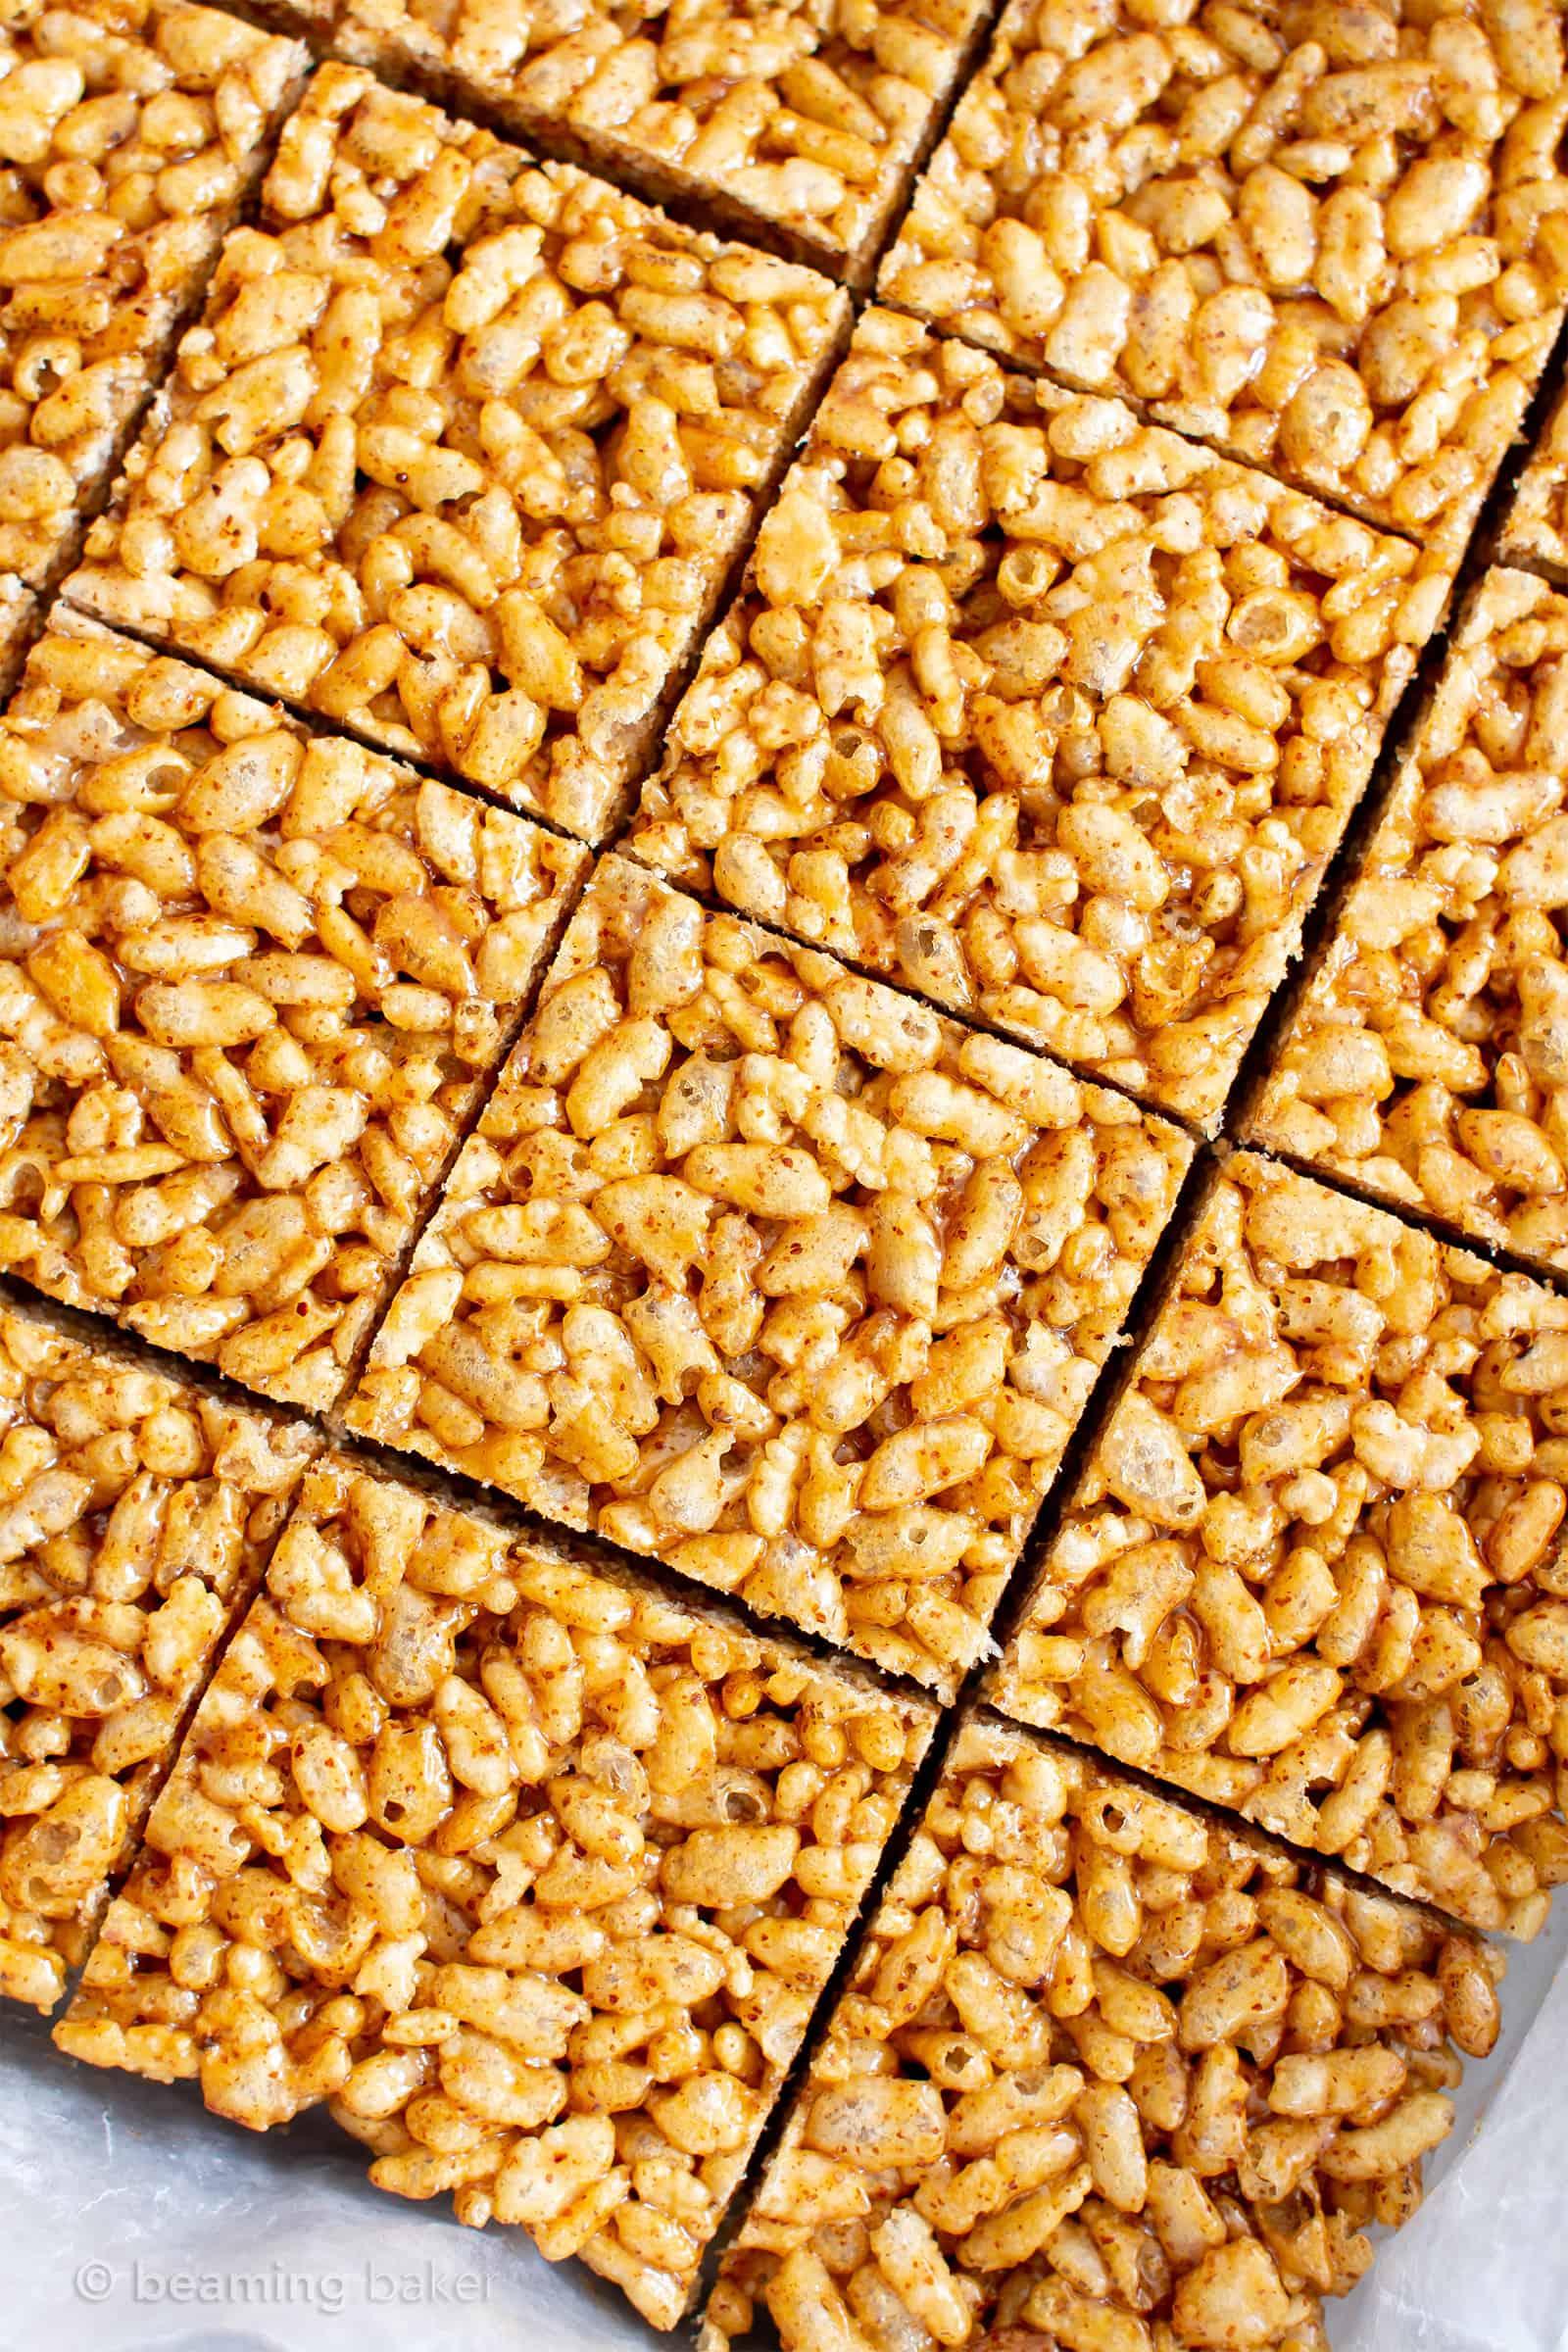 3 Ingredient Healthy Vegan Rice Crispy Treats (V, GF): a chewy homemade vegan rice krispy treats recipe, made with whole, gluten-free, protein-rich ingredients. #RiceCrispyTreats #ProteinPacked #Vegan #GlutenFree #CleanEating #Snacks #HealthySnacks   Recipe at BeamingBaker.com